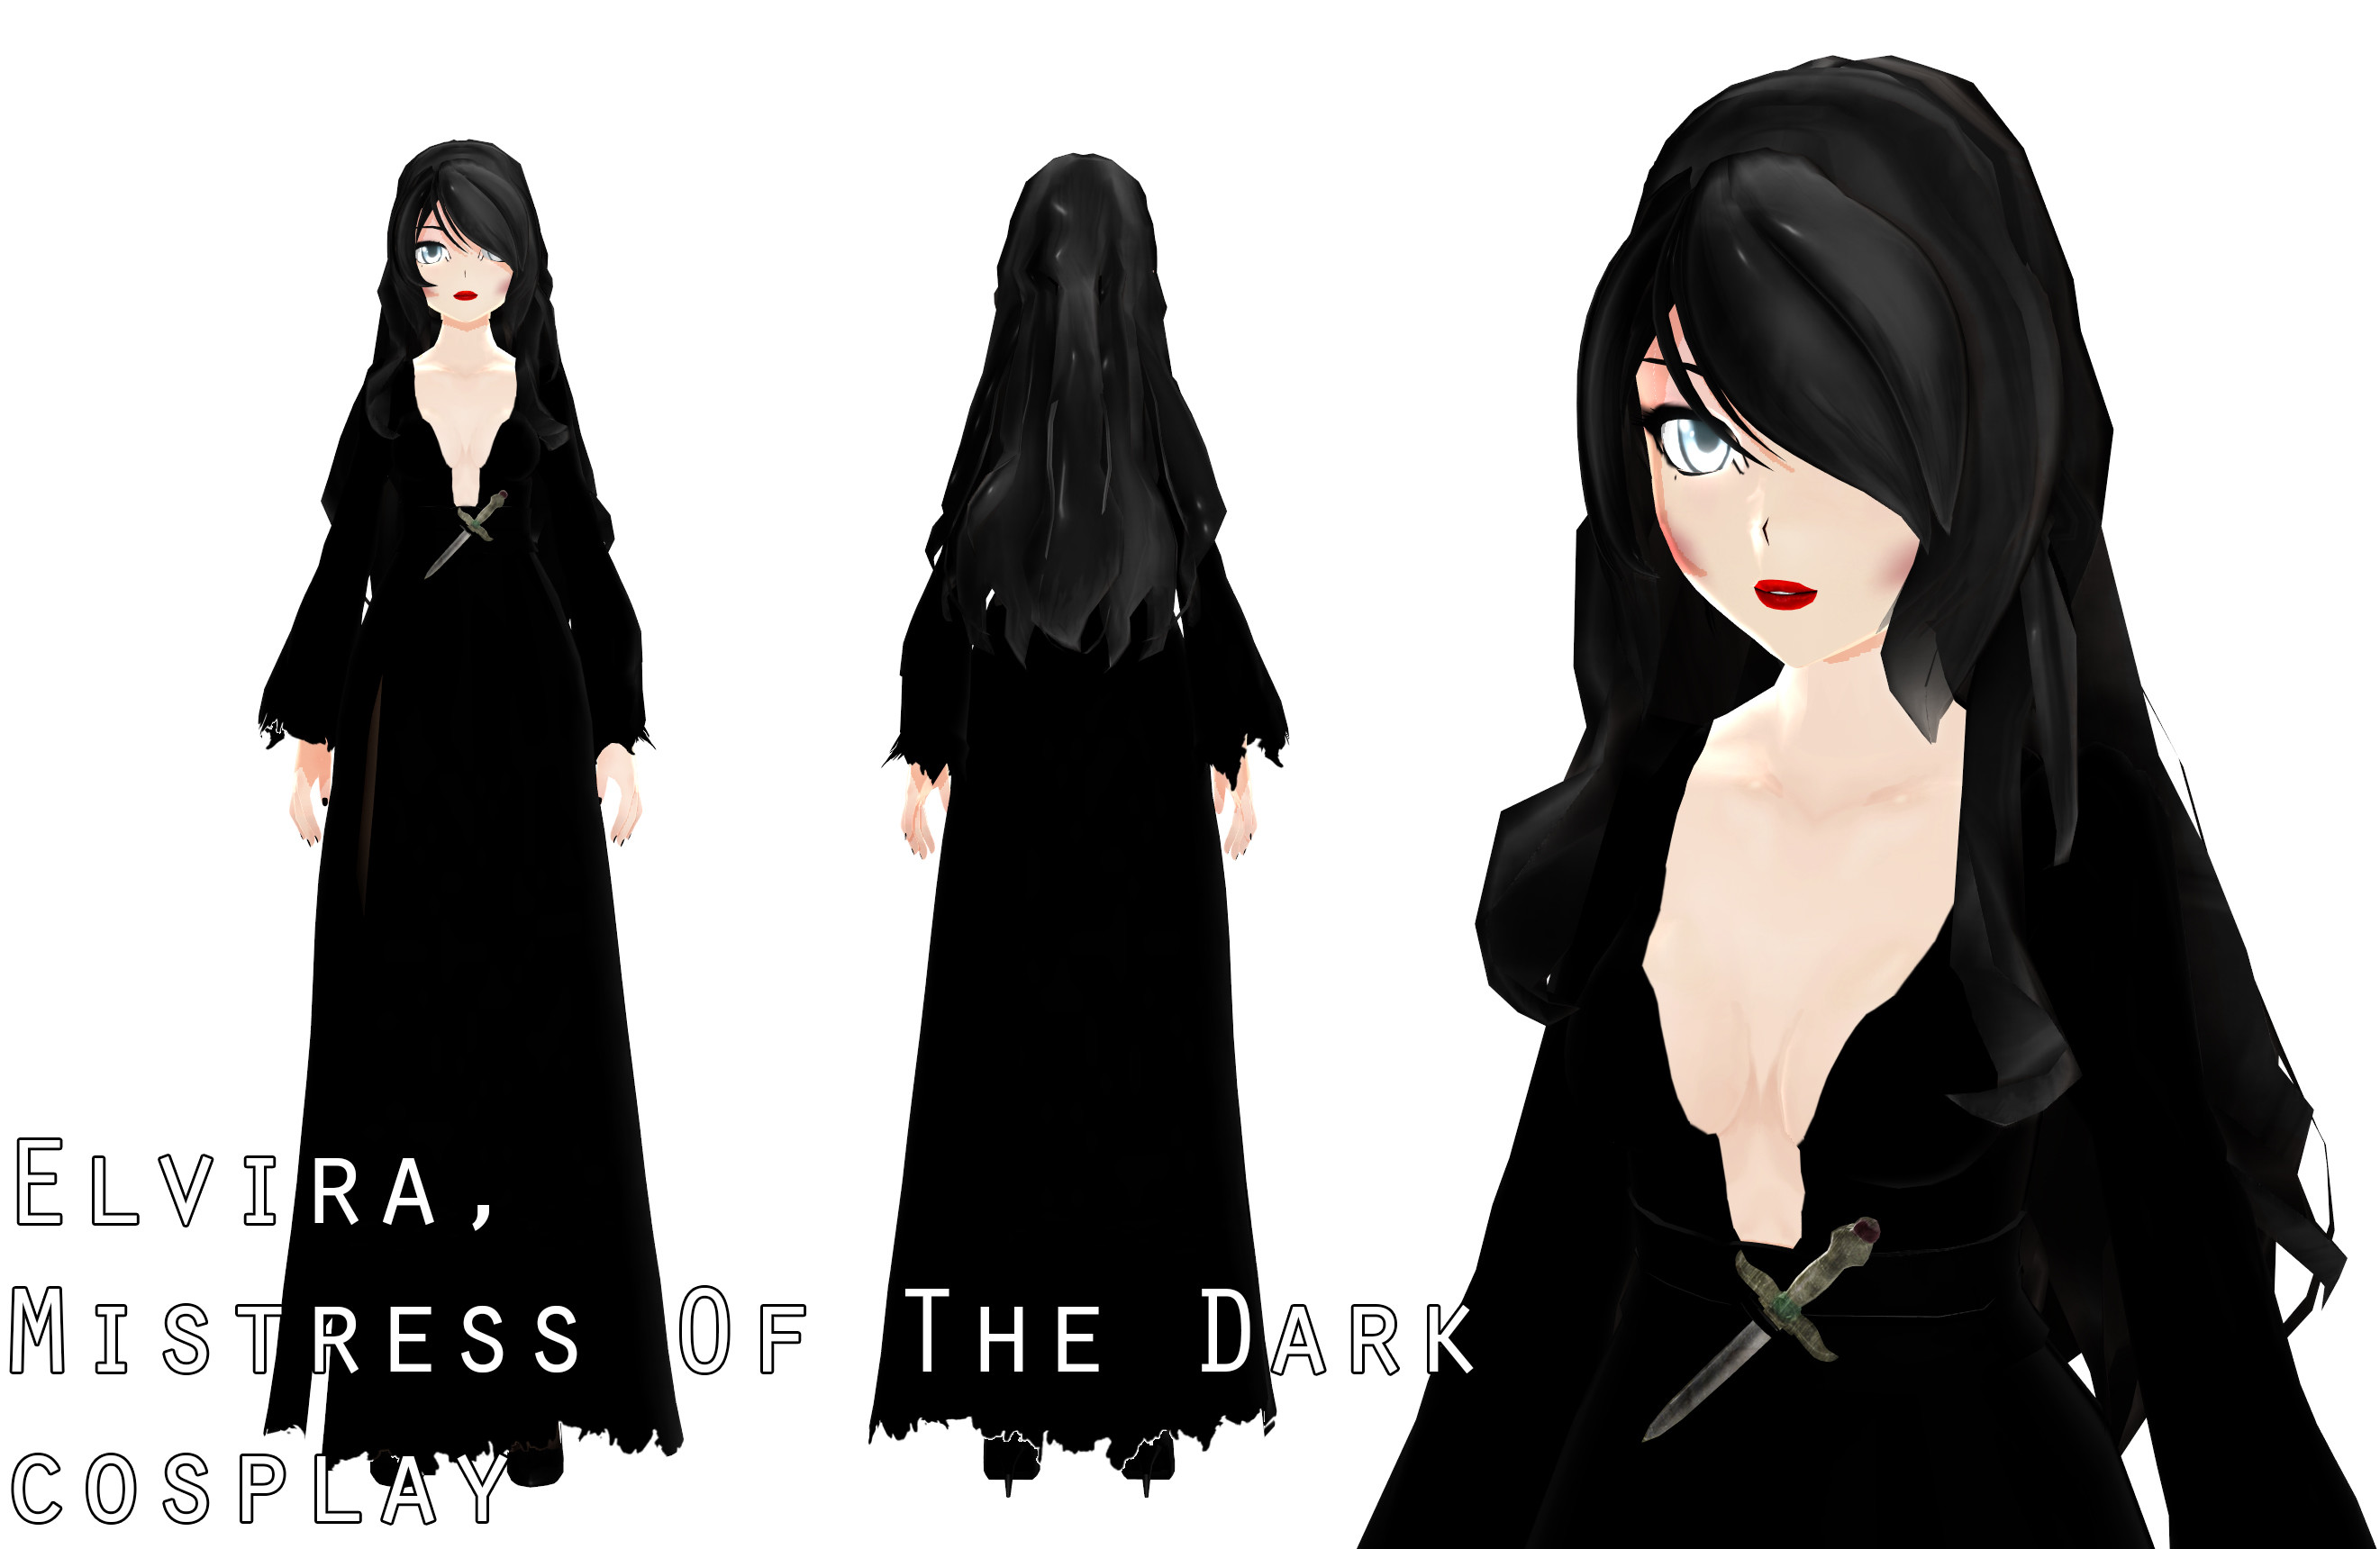 … ElviraMoa ~Elvira, Mistress Of The Dark cosplay~Halloween~ by ElviraMoa